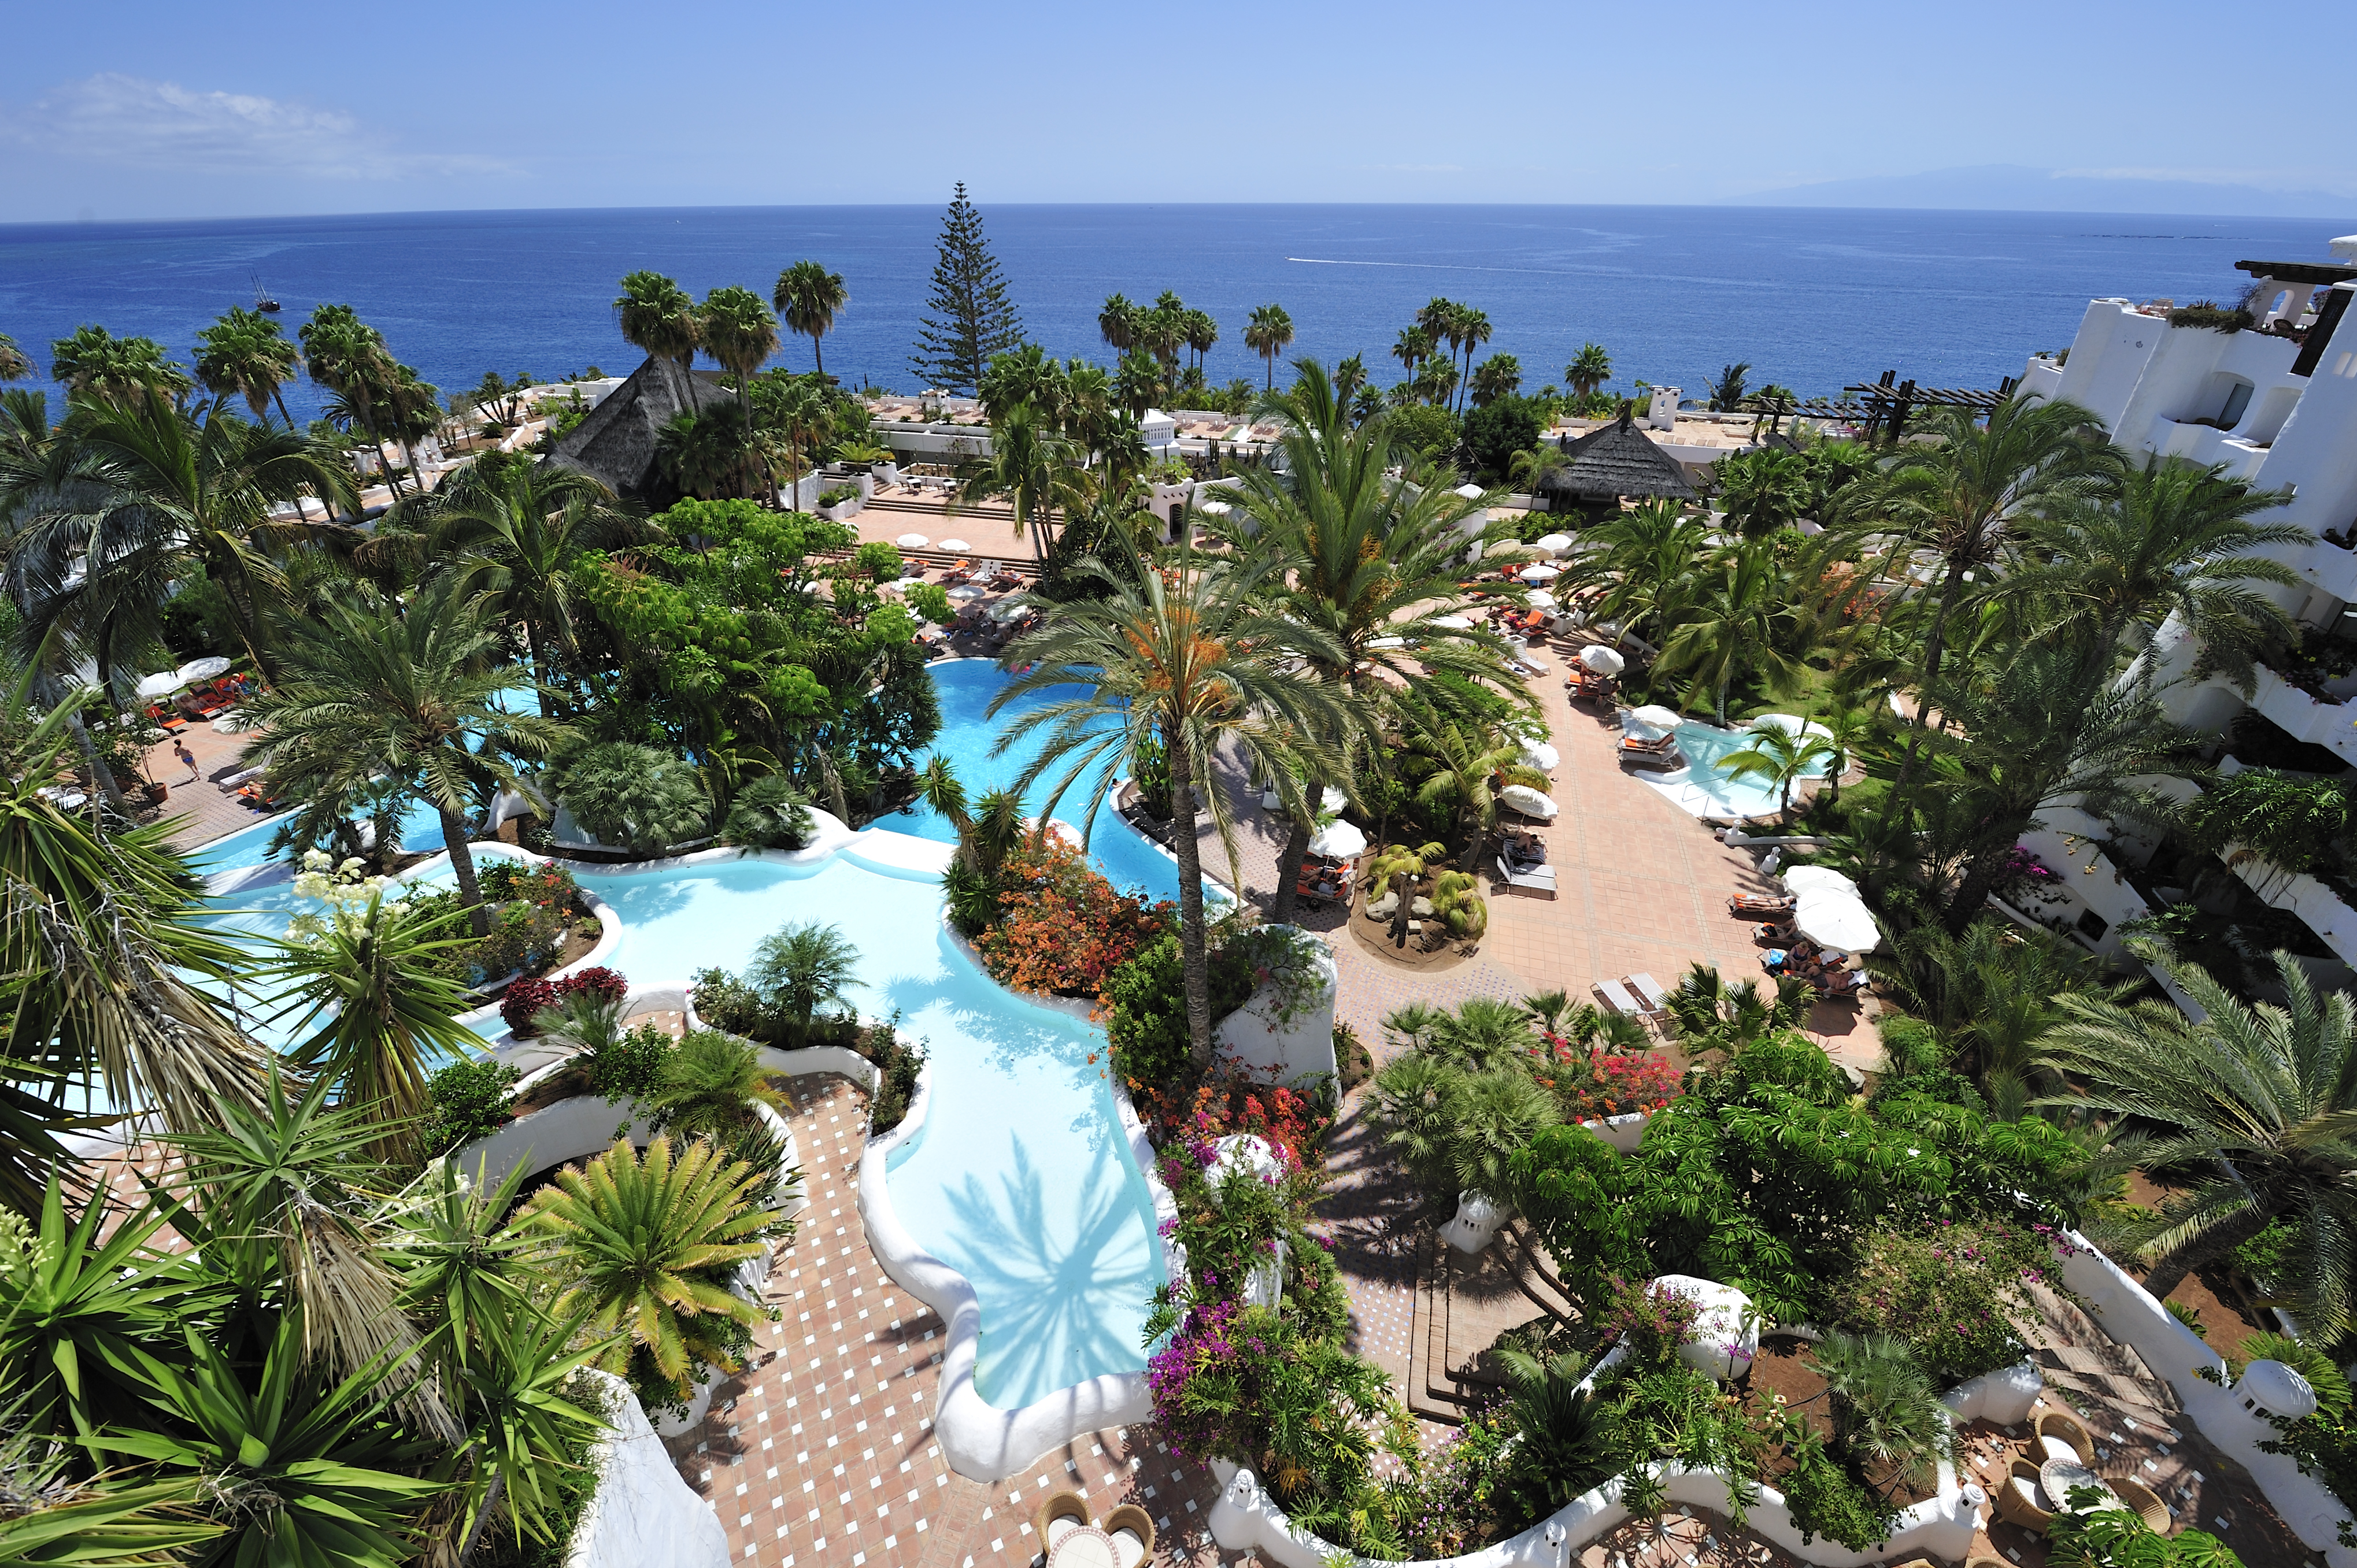 Tropical 4 Nl Hotel Avec Canaries Voyages Jardin Sejour Auchan WD9IEeH2Y